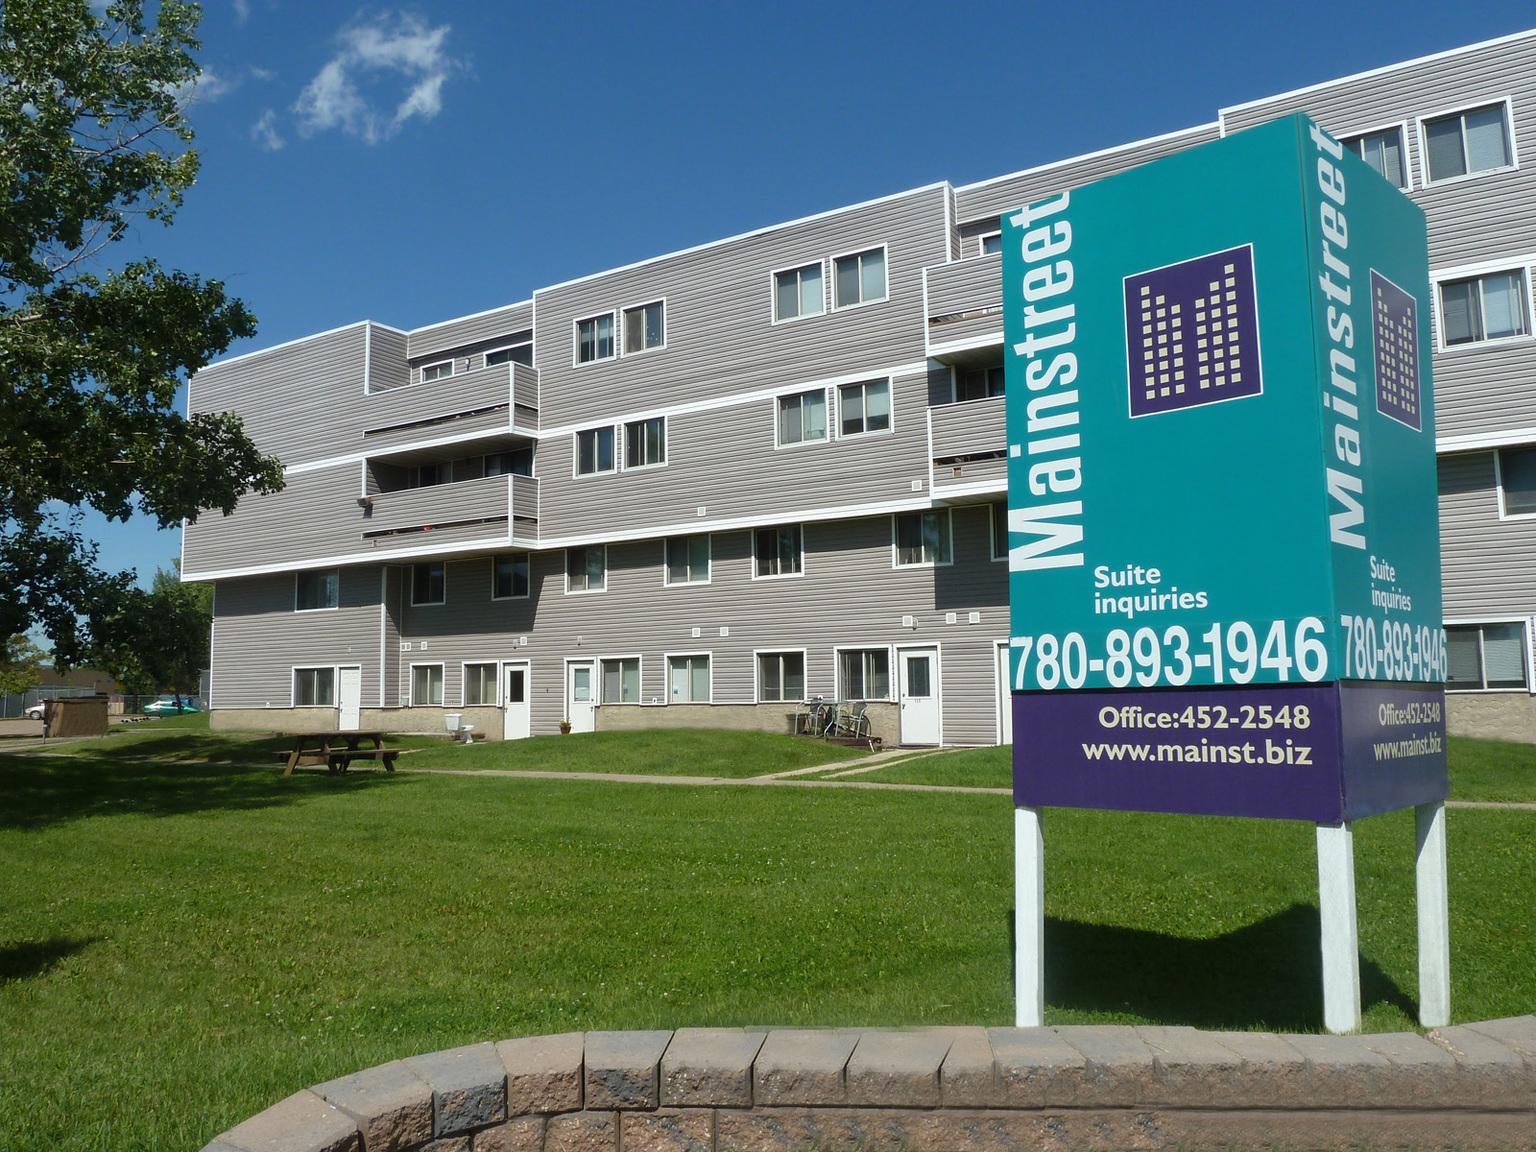 2606 139 Avenue NW, Edmonton, AB - $1,075